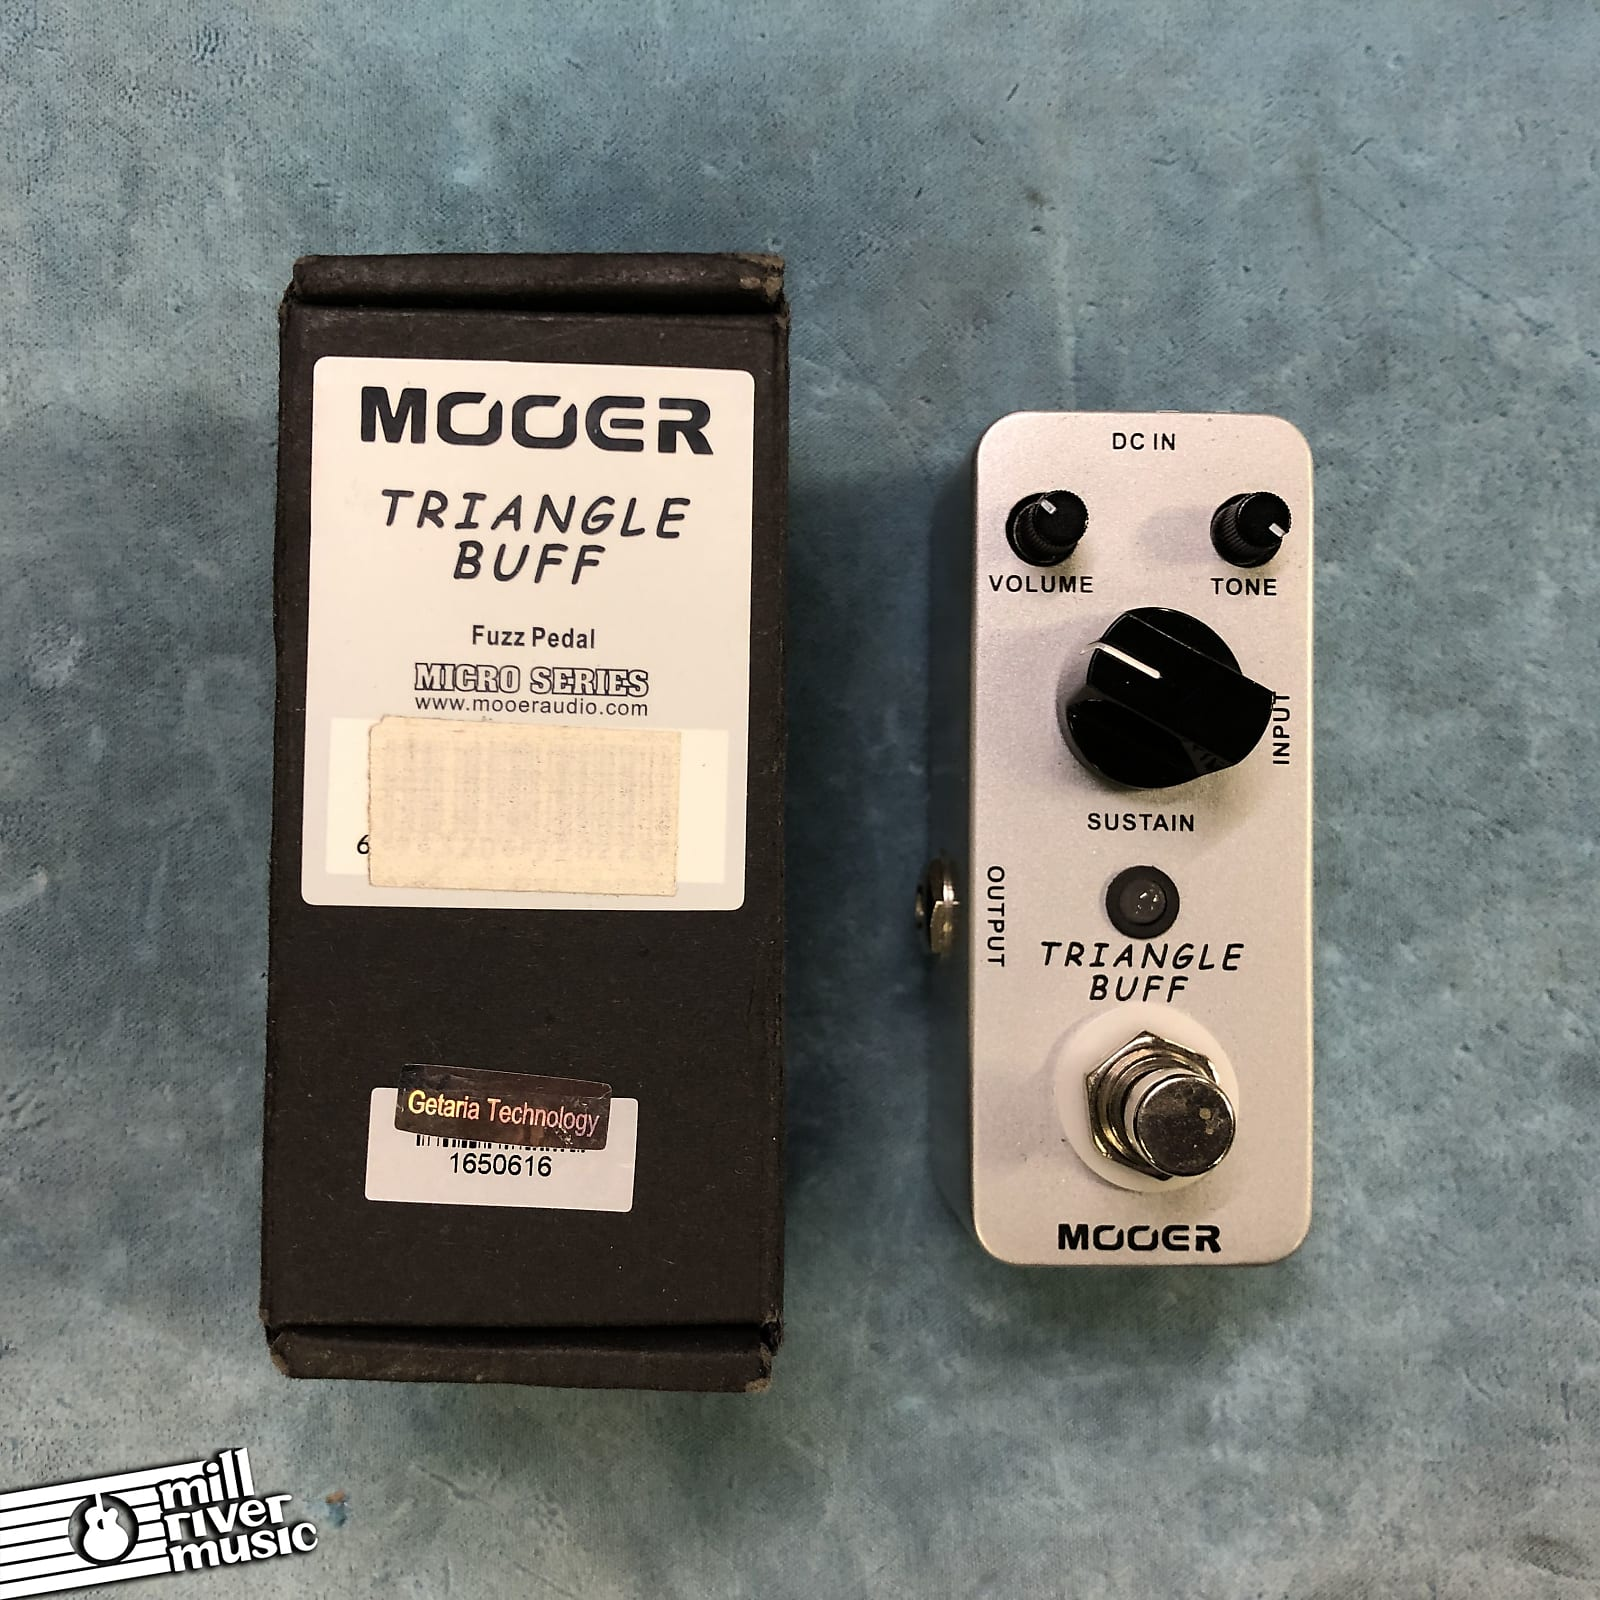 Mooer Triangle Buff Micro Fuzz Effects Pedal w/ Box